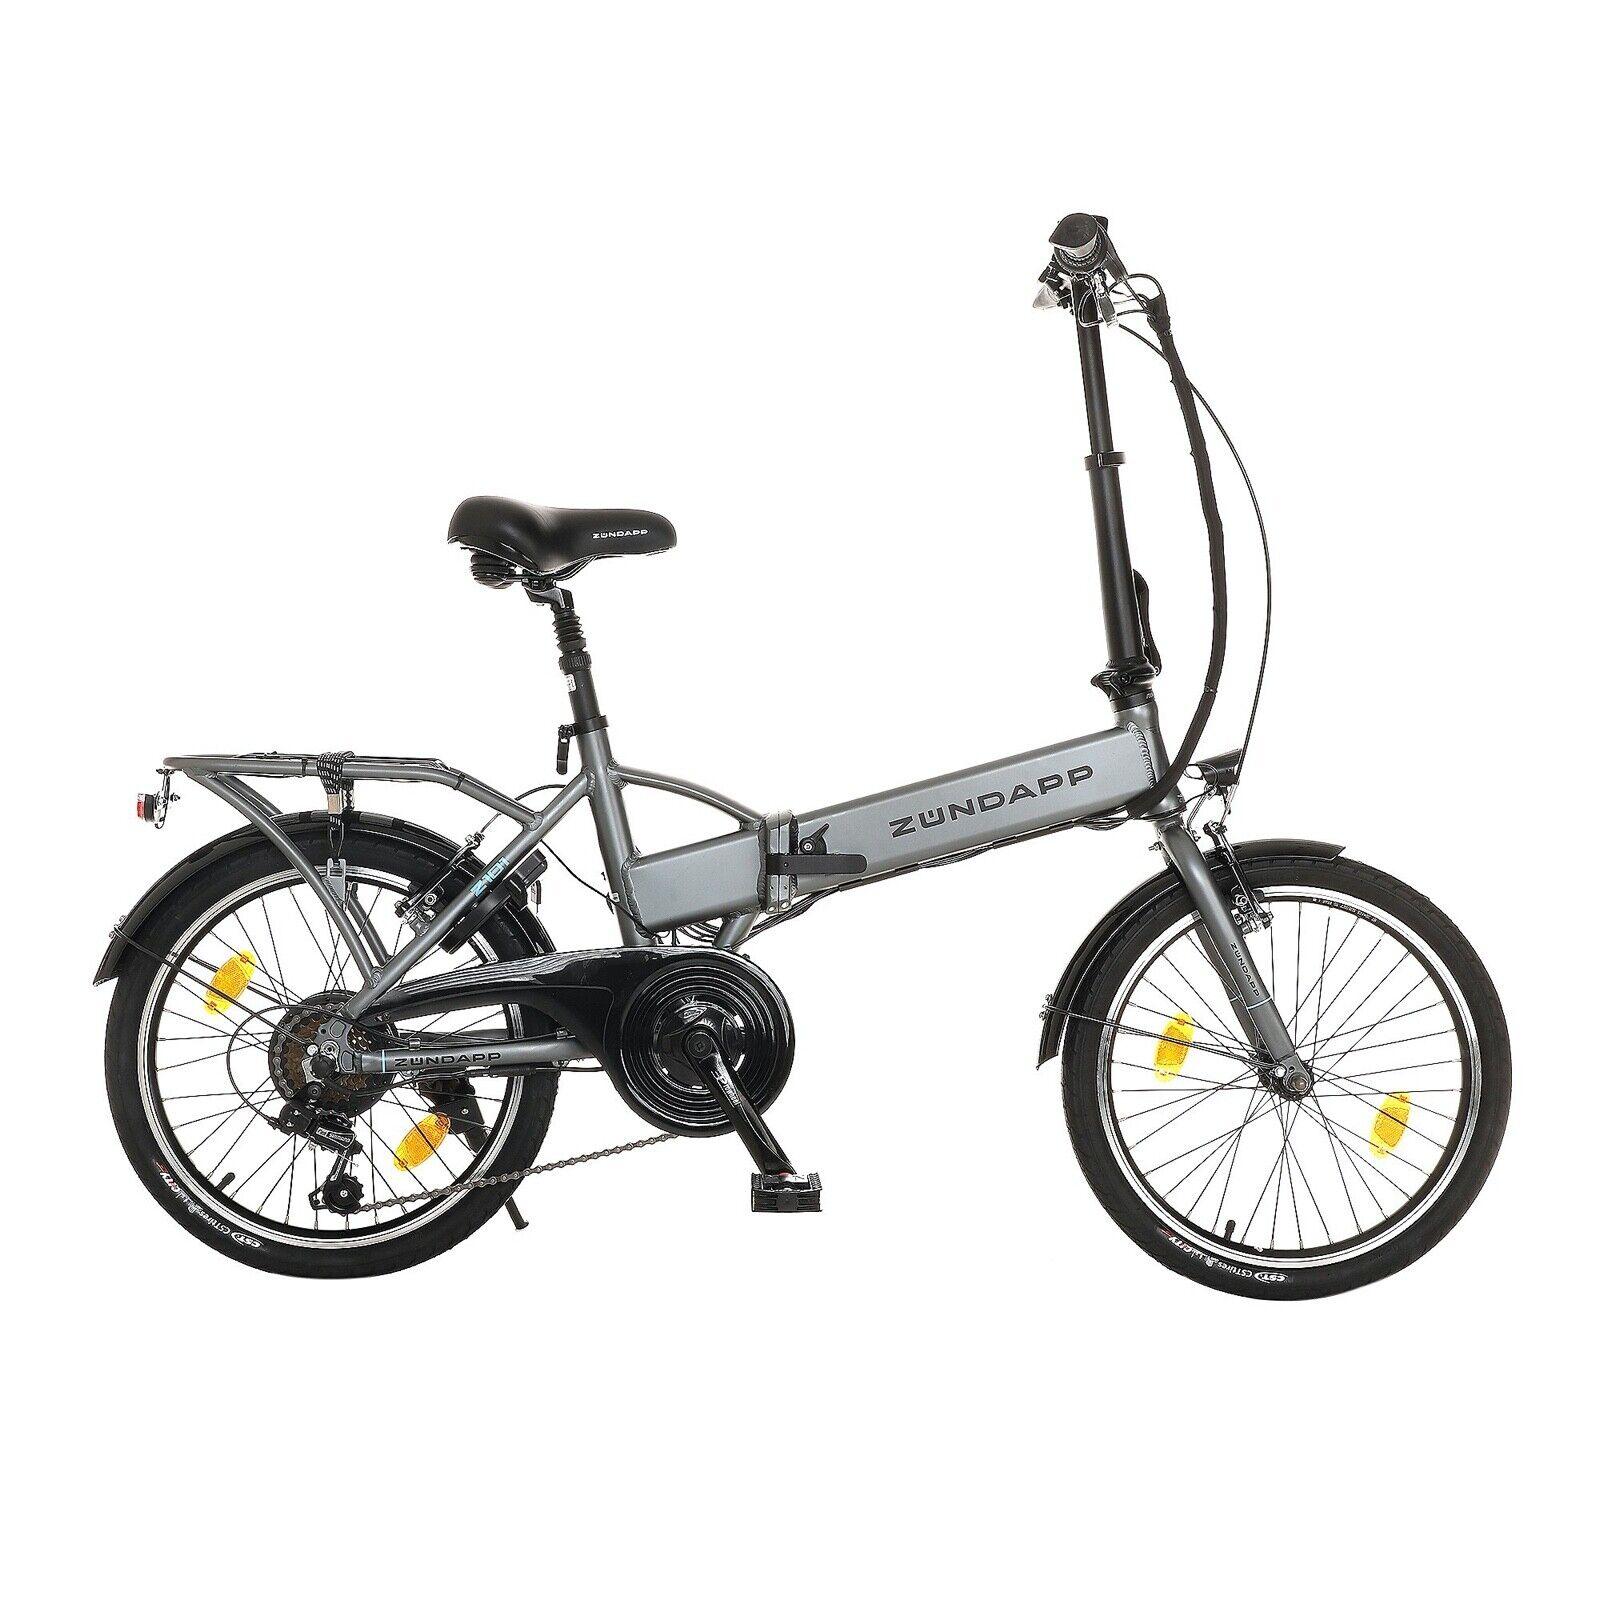 E-Bike 20 Zoll Zündapp Z101 Faltrad Pedelec Elektrofaltrad B-WARE